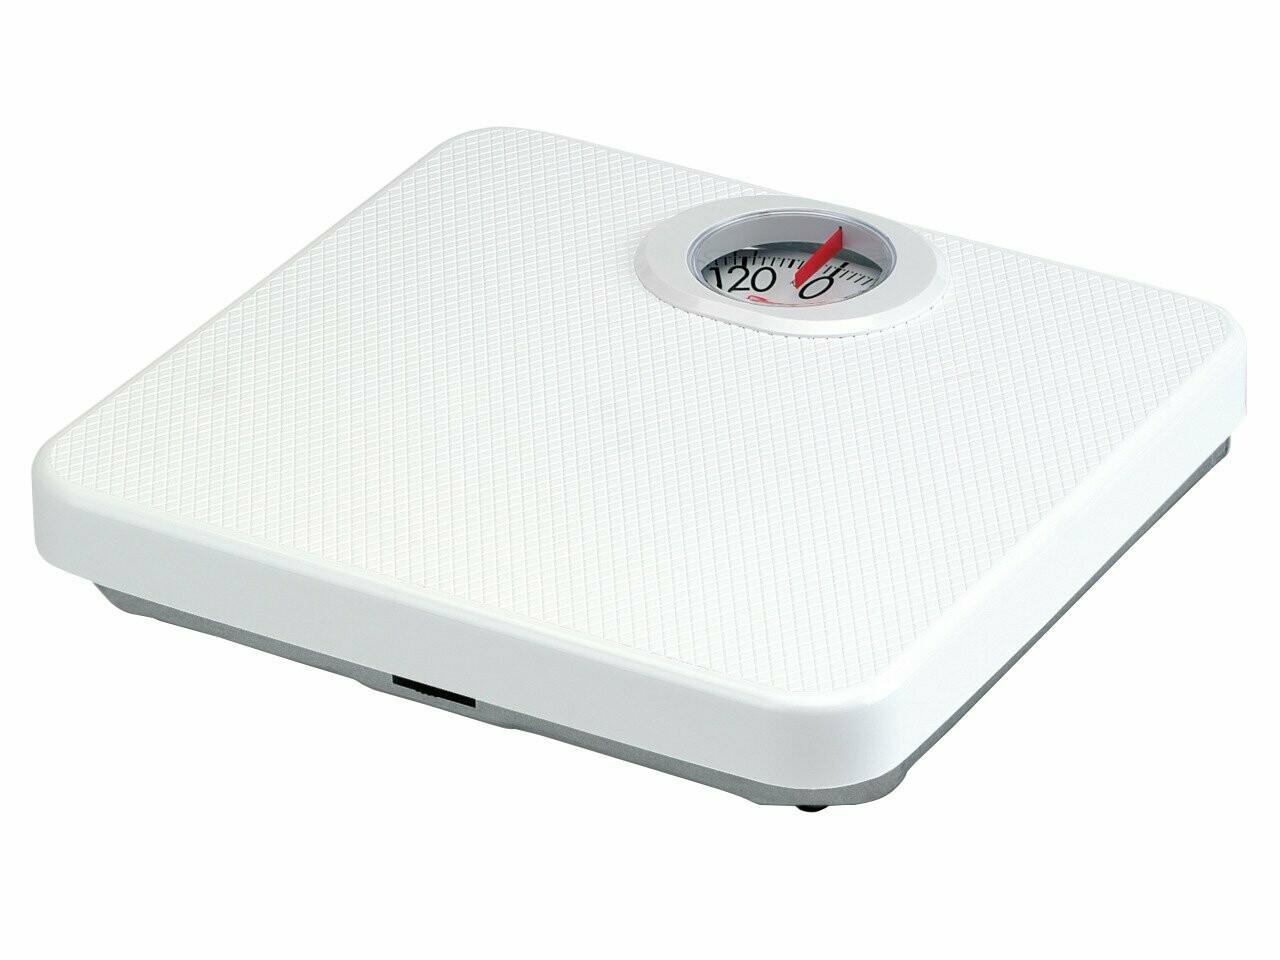 Soehnle Standard Analog Bathroom Personal Scale 61012